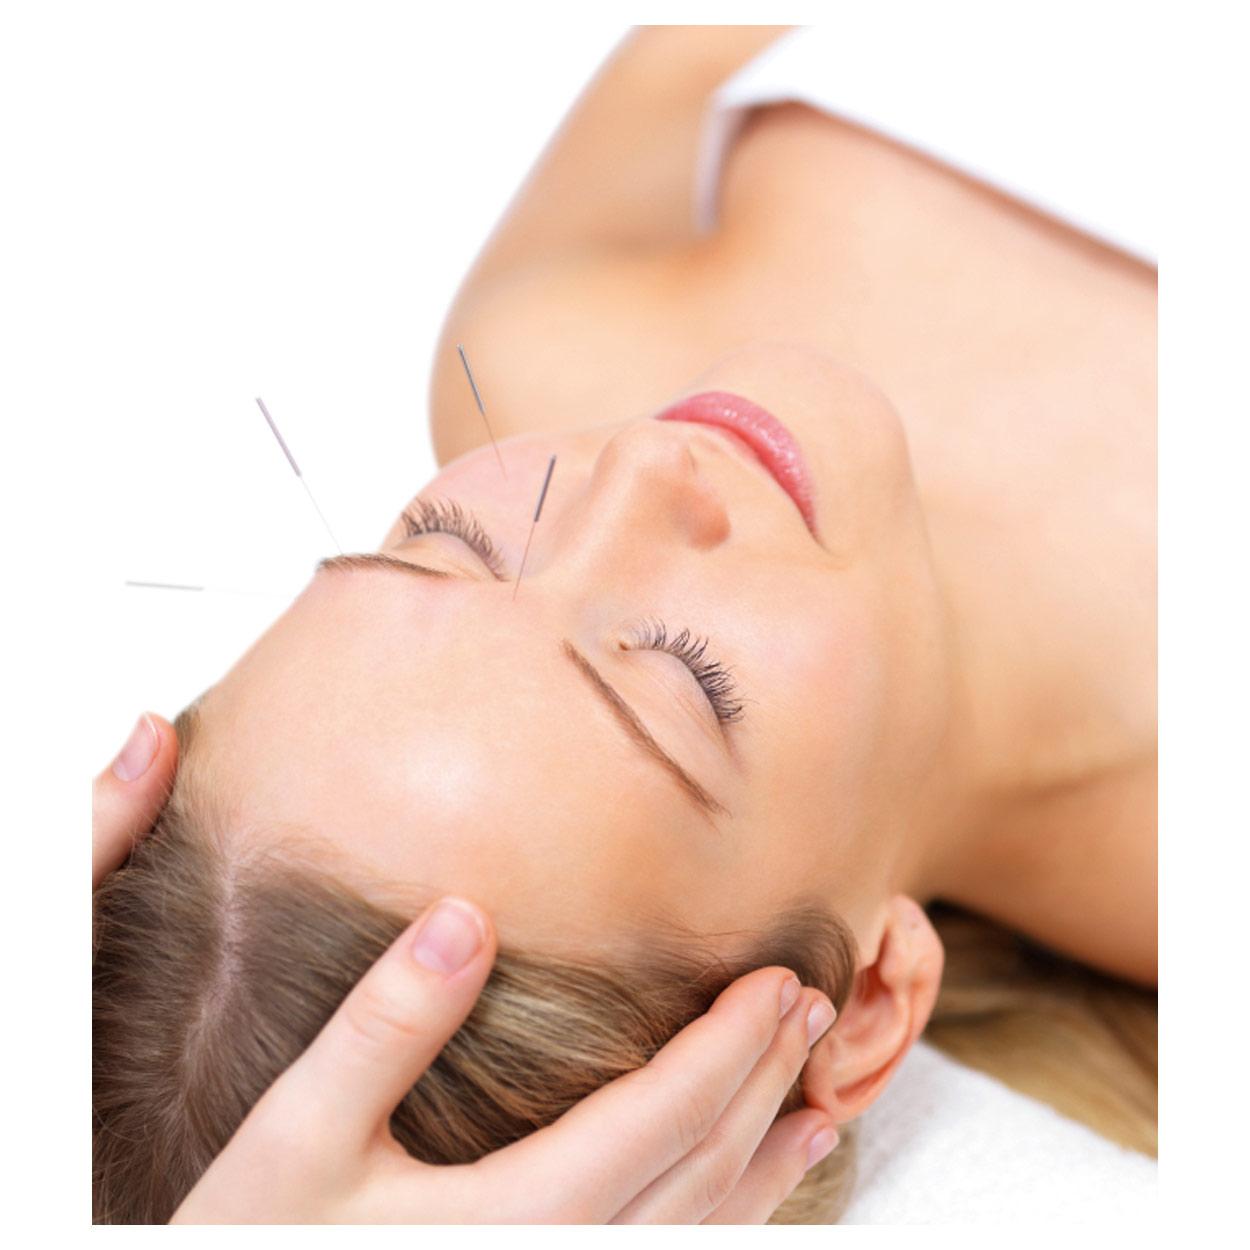 Indexbild 4 - Akupunkturnadeln mit Kunststoffgriff, Akupunktur